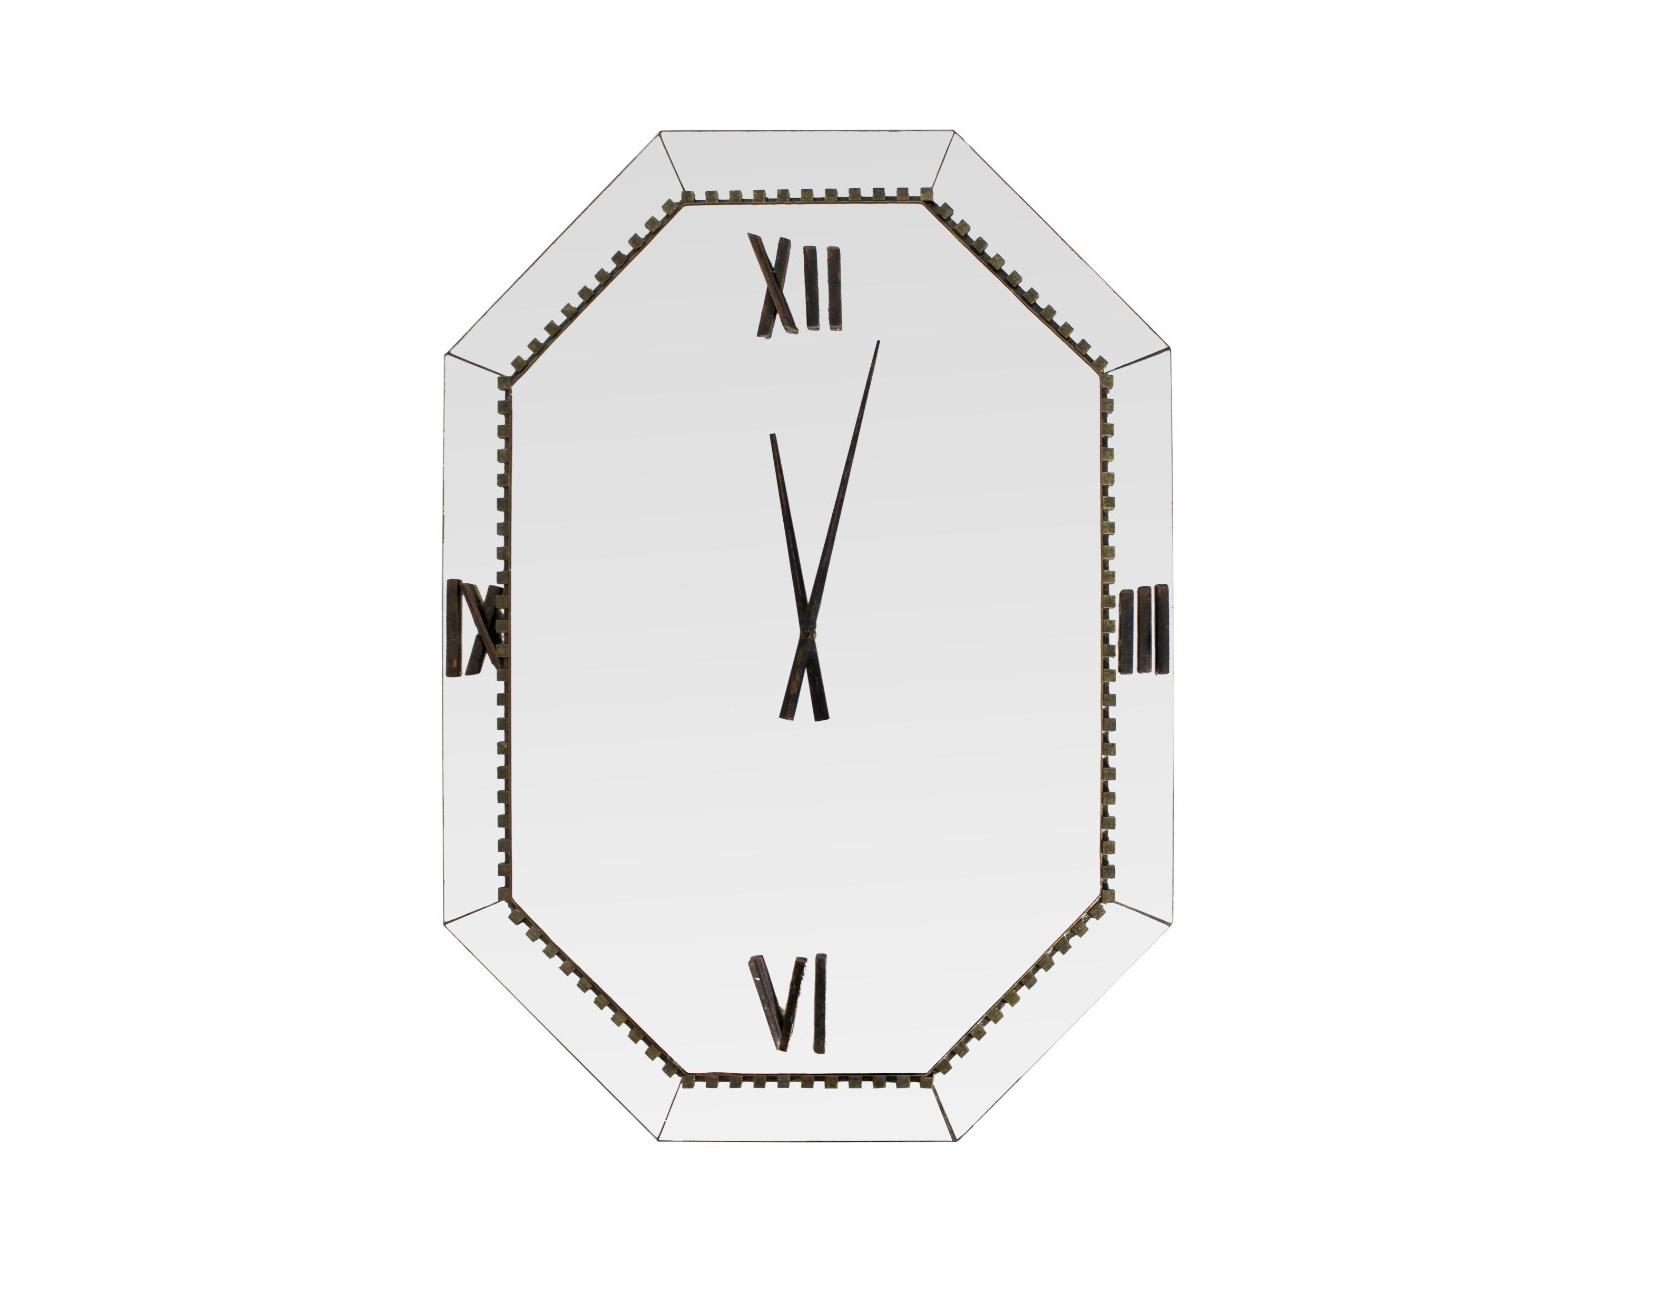 Зеркало-часы wilson (bountyhome) серебристый 60.0x85.0x4.0 см.